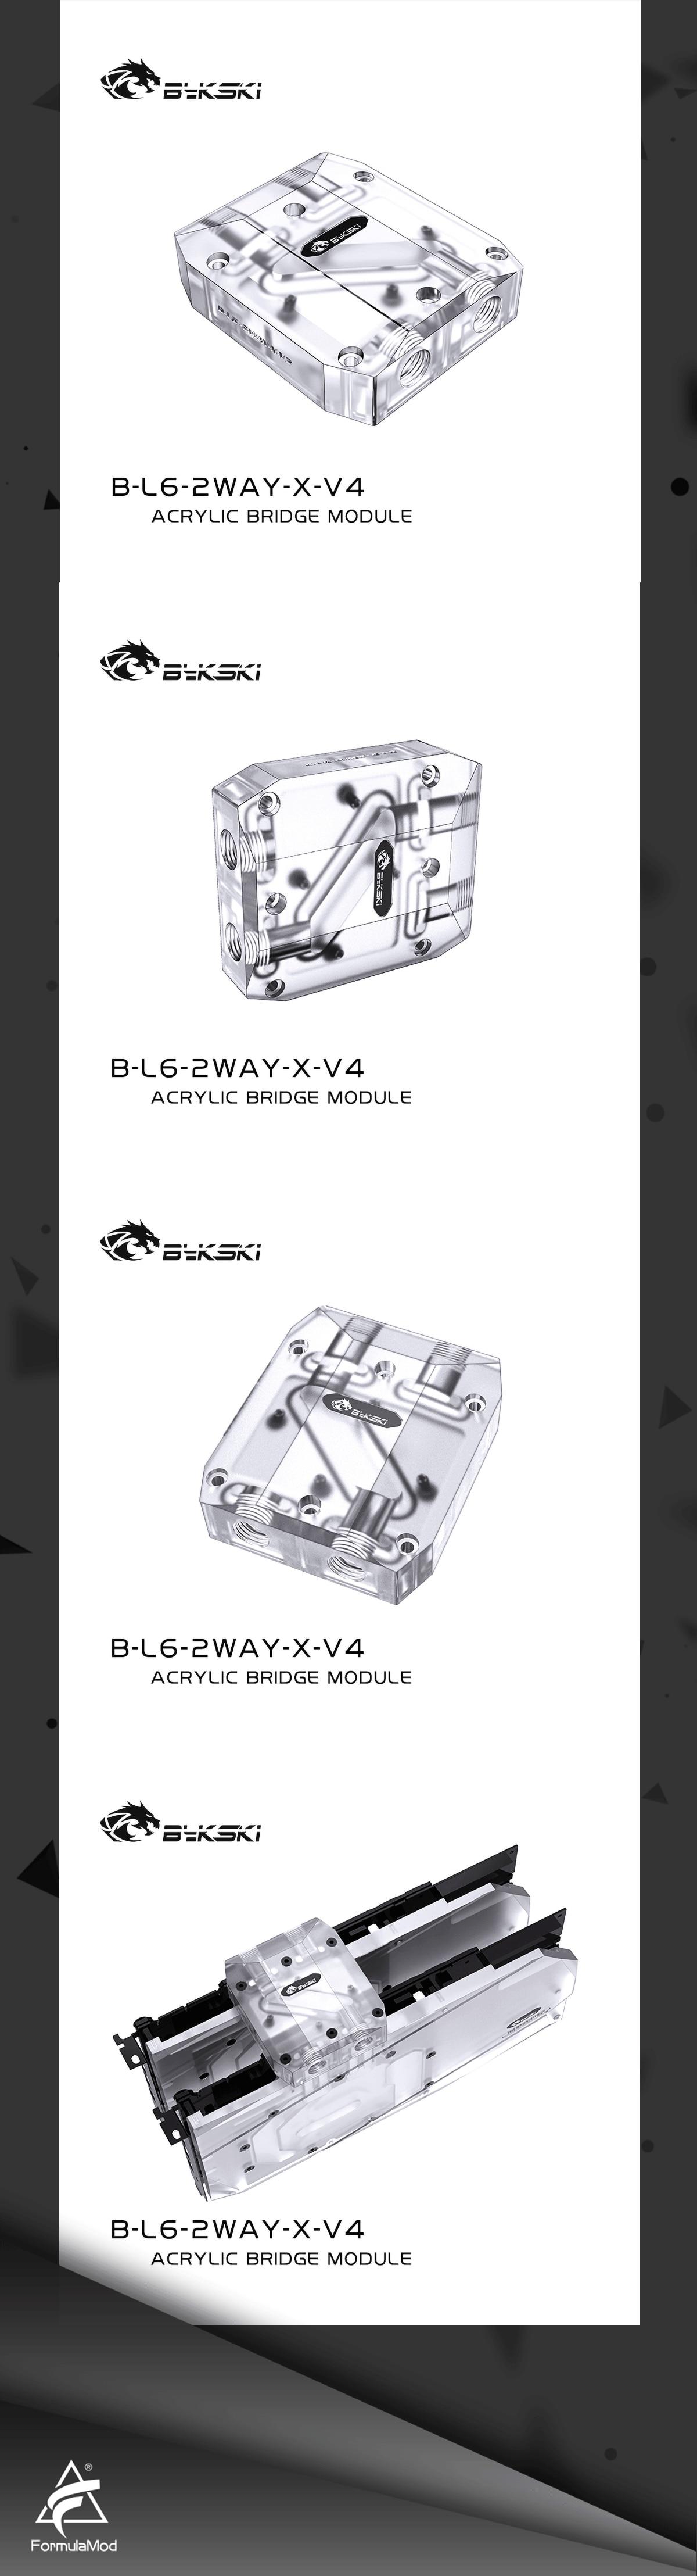 Bykski B-L6-2WAY-X-V4 Graphics Card GPU Waterway Connection Adjustment Bridges Acrylic Connectors Water Cooling